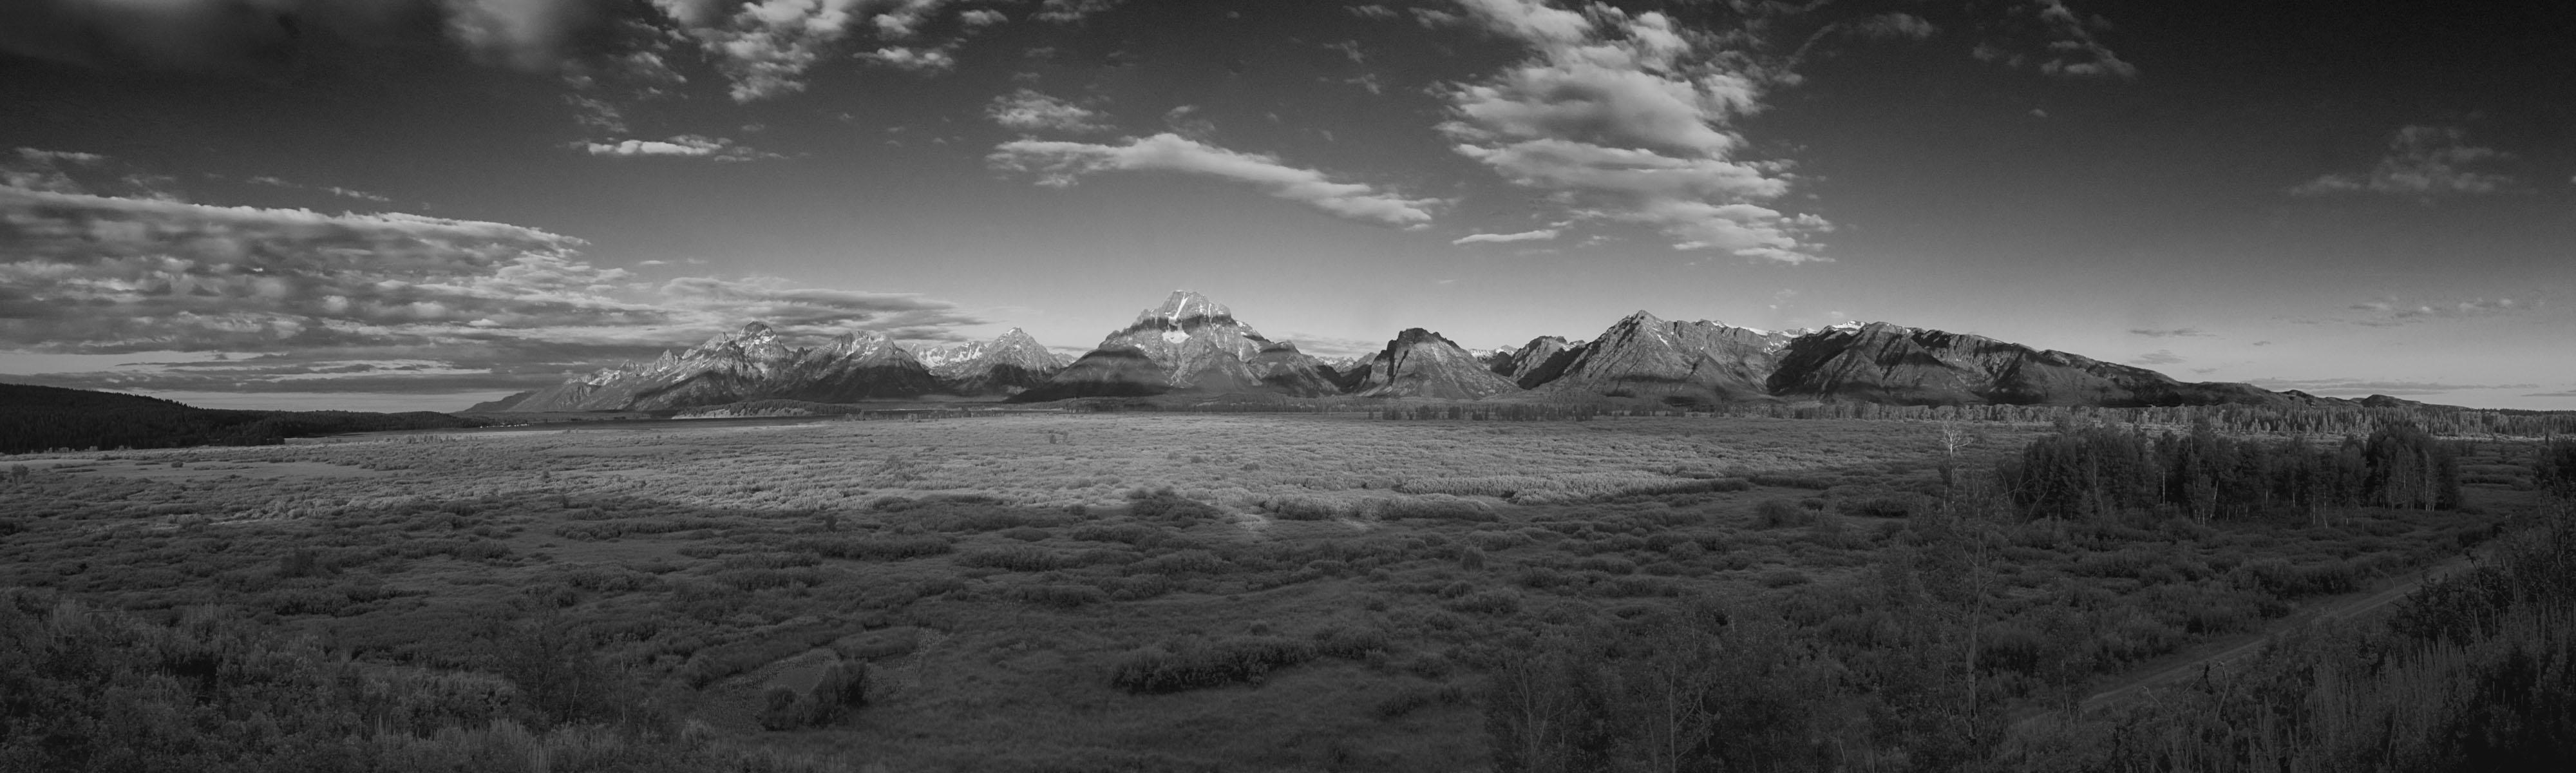 Evening Sets on Grand Tetons